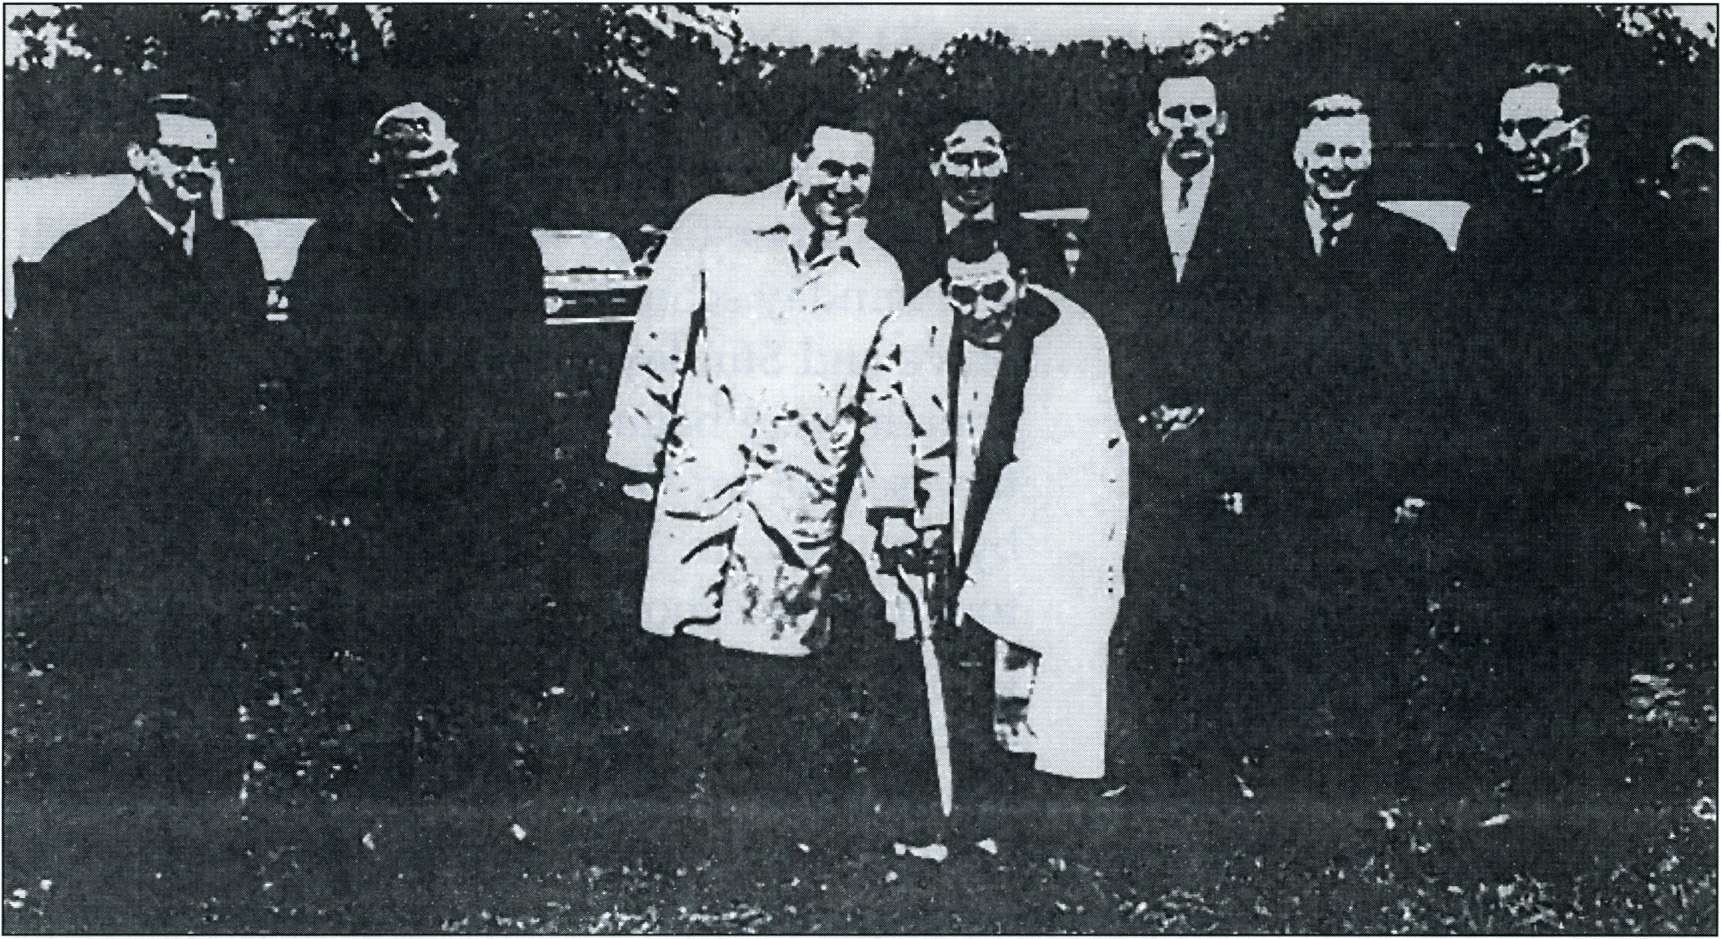 Groundbreaking 1966 Left to Right-Simon Kern, Louis Erbrecht, Norman Erbrecht, Louis Regine, Rev. H.K. Dietrich Jr., Clyde Oelschlager, Ray Colin, Louis Behling.